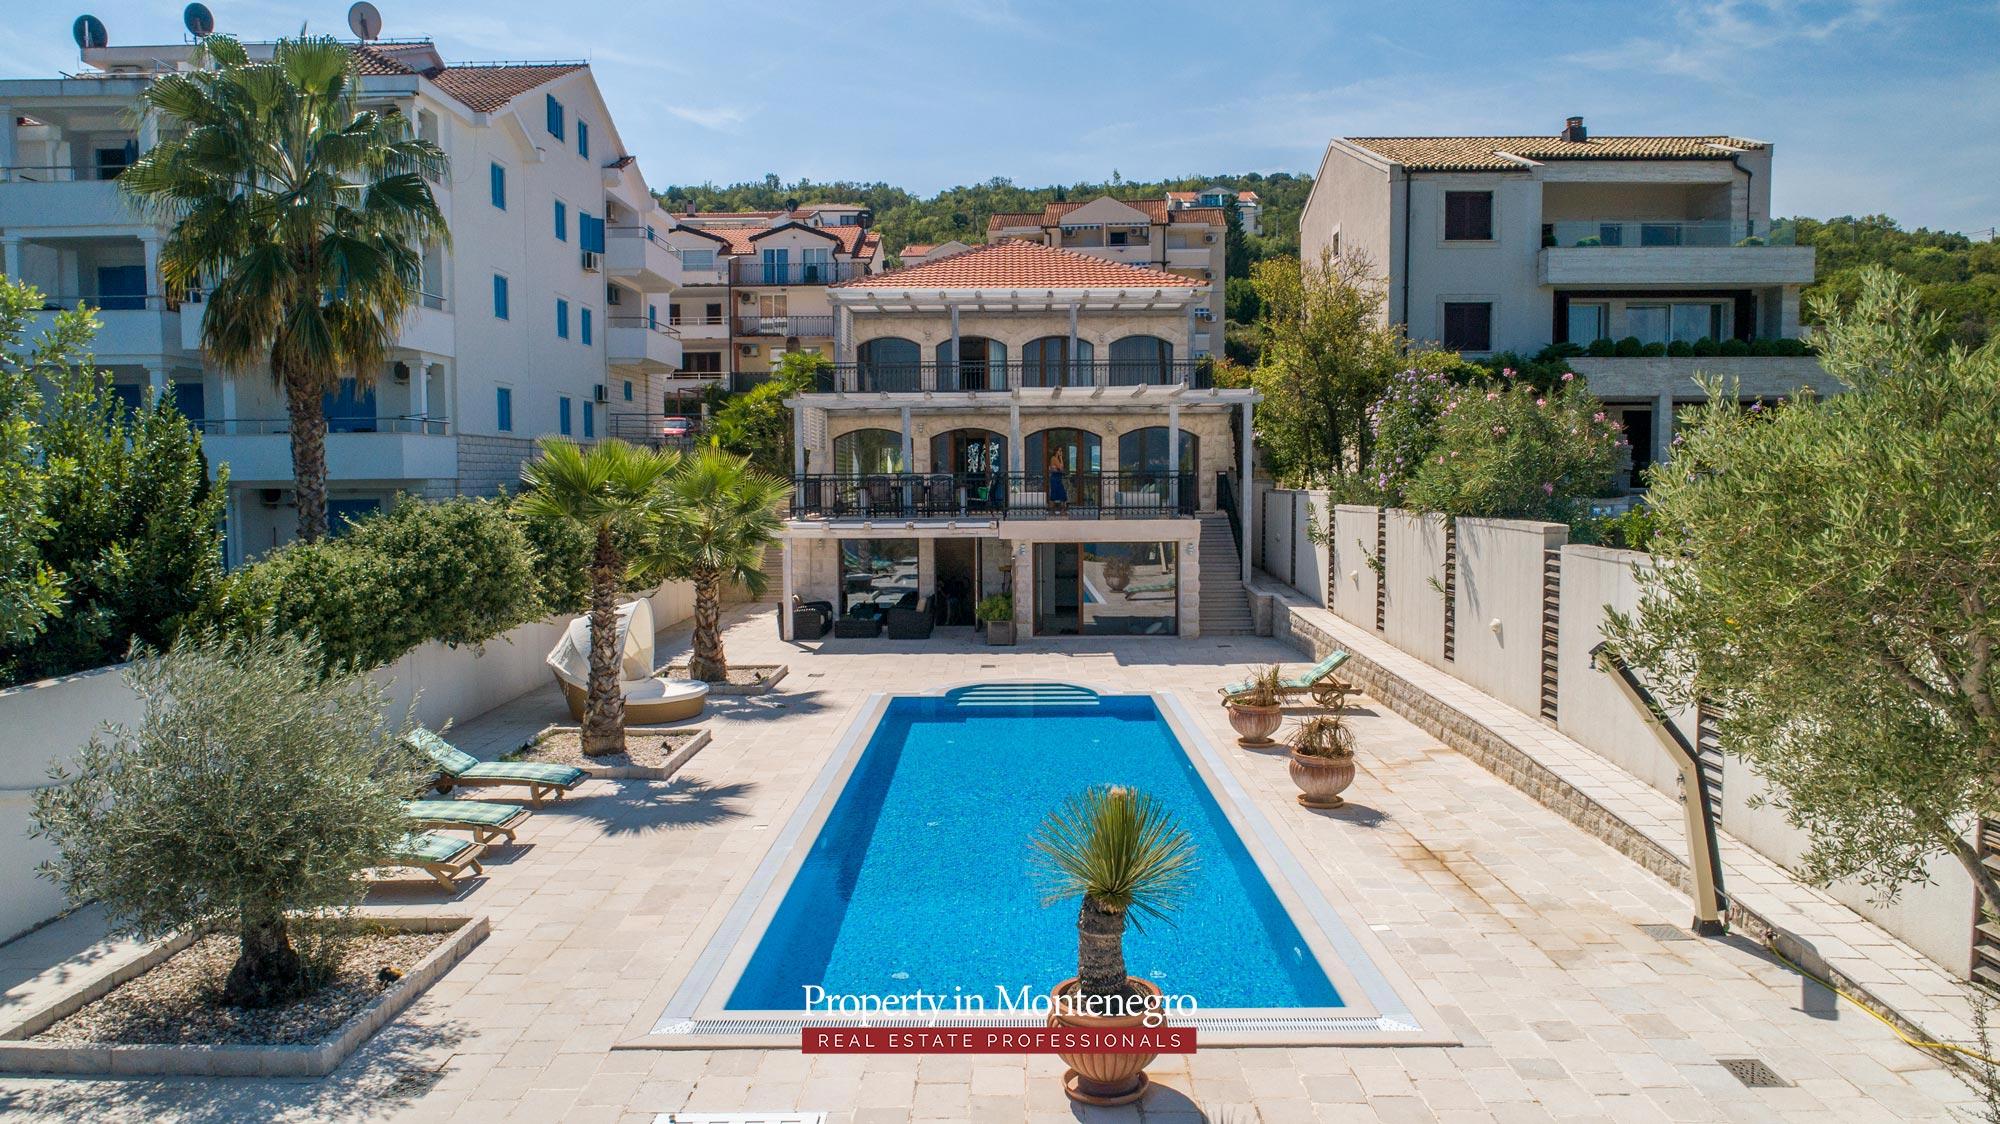 First-line-luxury-villa-for-sale-in-Tivat (19).jpg